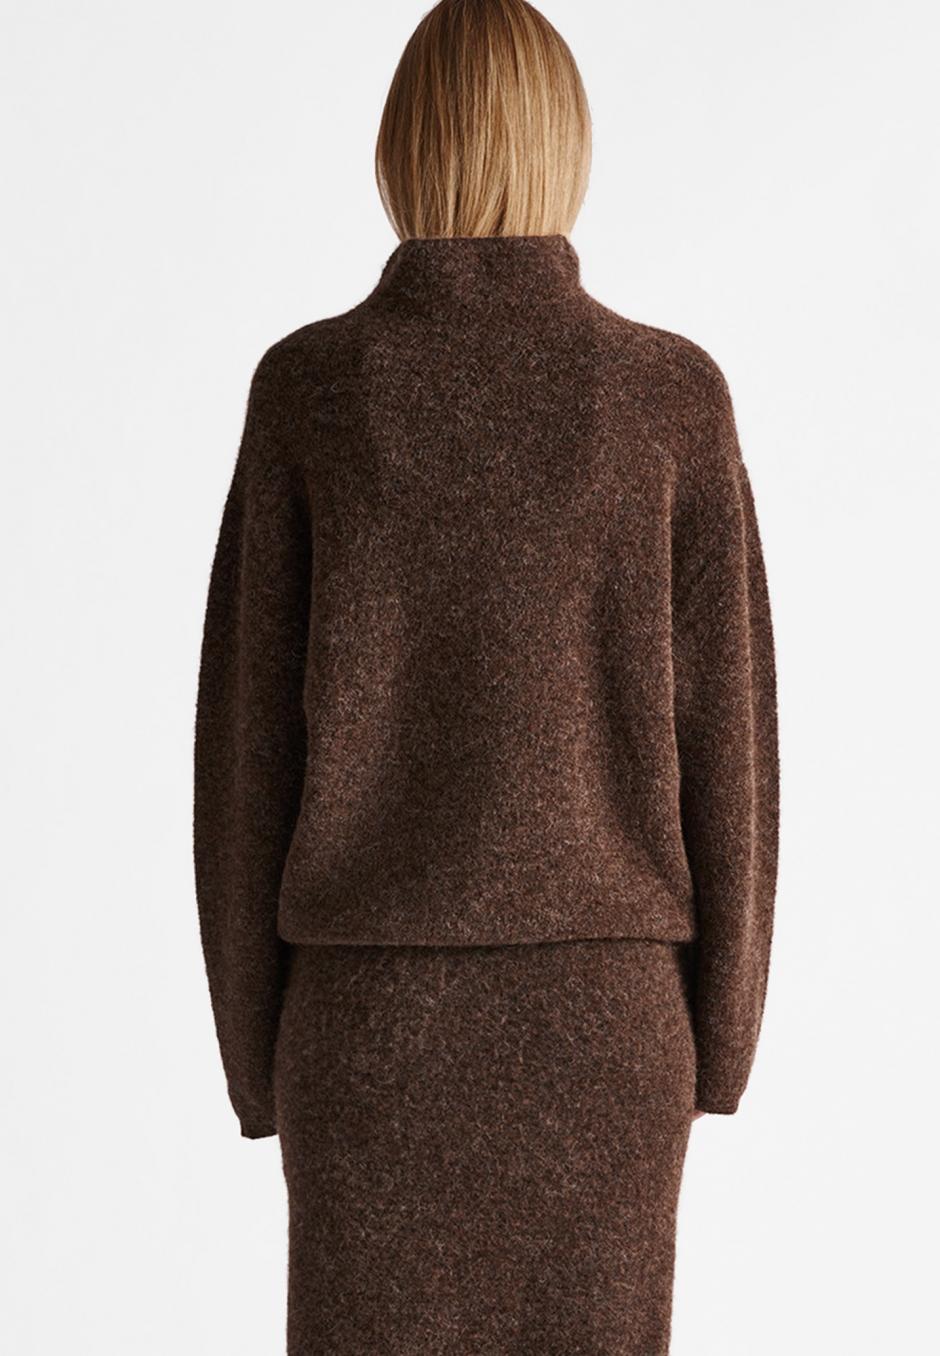 Stylein Eliot Sweater